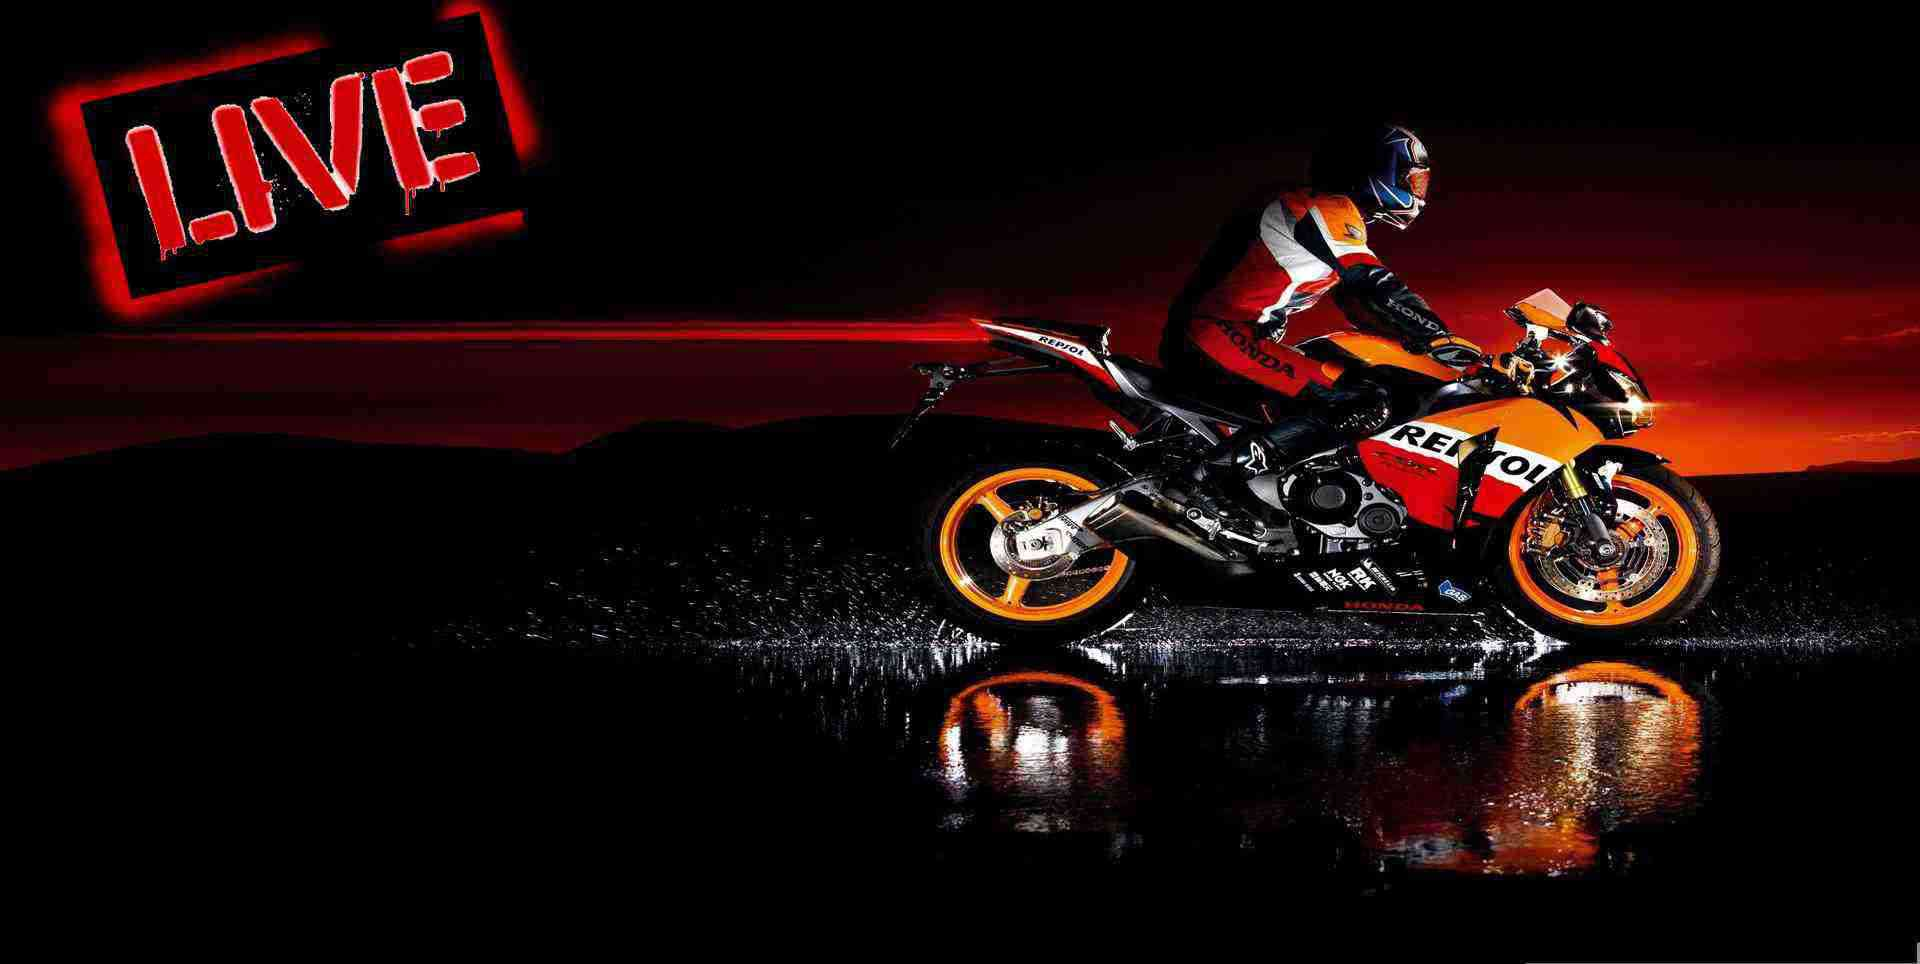 motogp-grand-prix-of-australian-2015-live